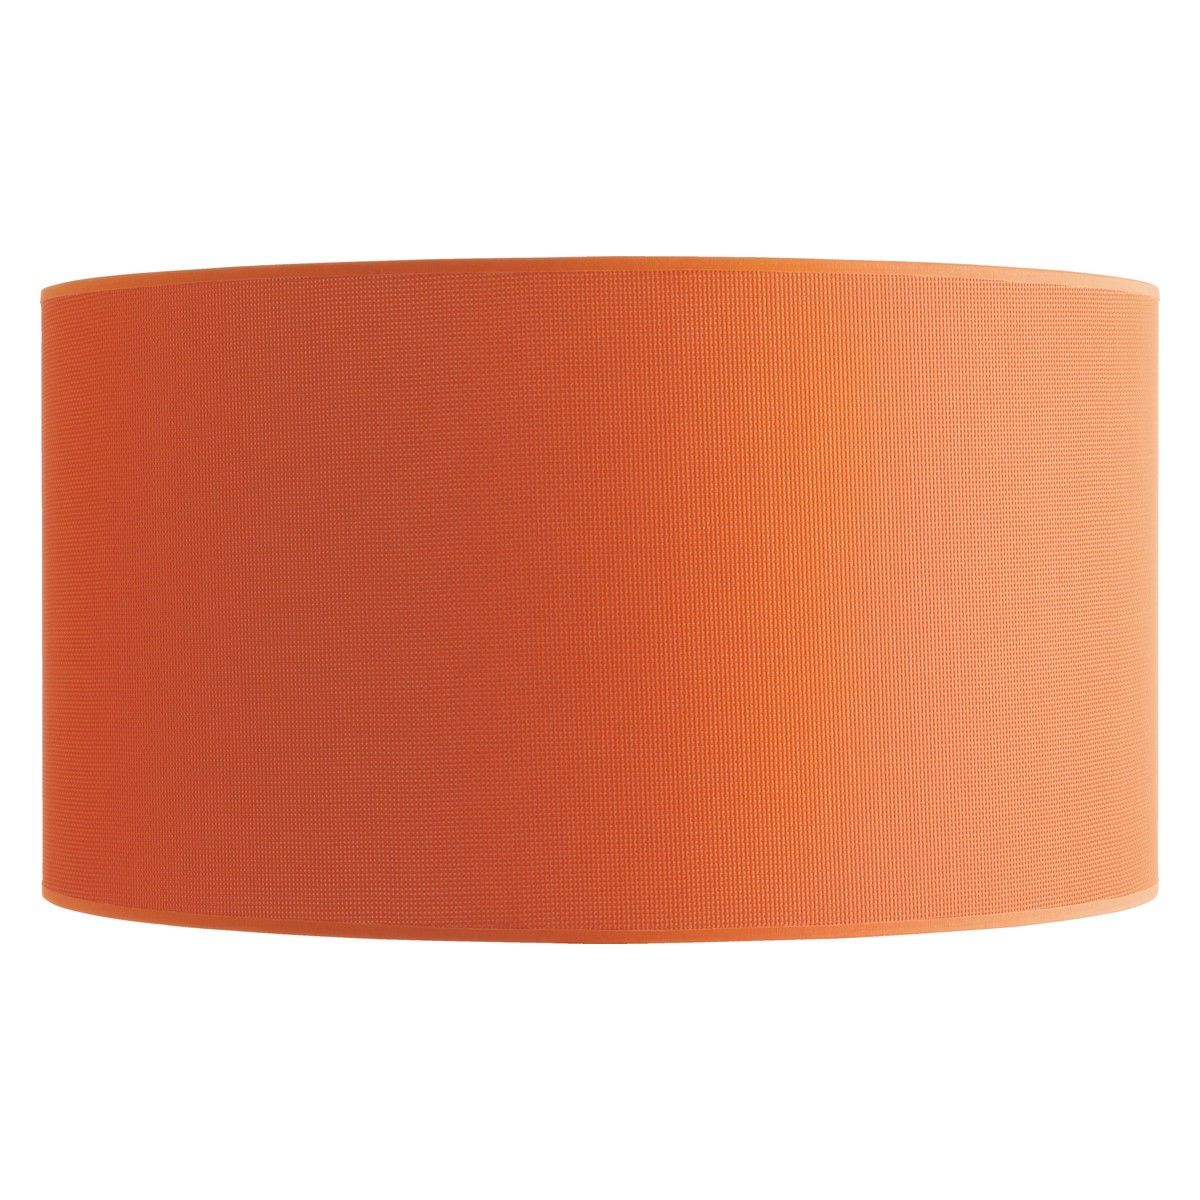 Jacks orange mesh drum lamp shade d45 x h24cm drum lamp shades jacks orange mesh drum lamp shade d45 x h24cm aloadofball Gallery